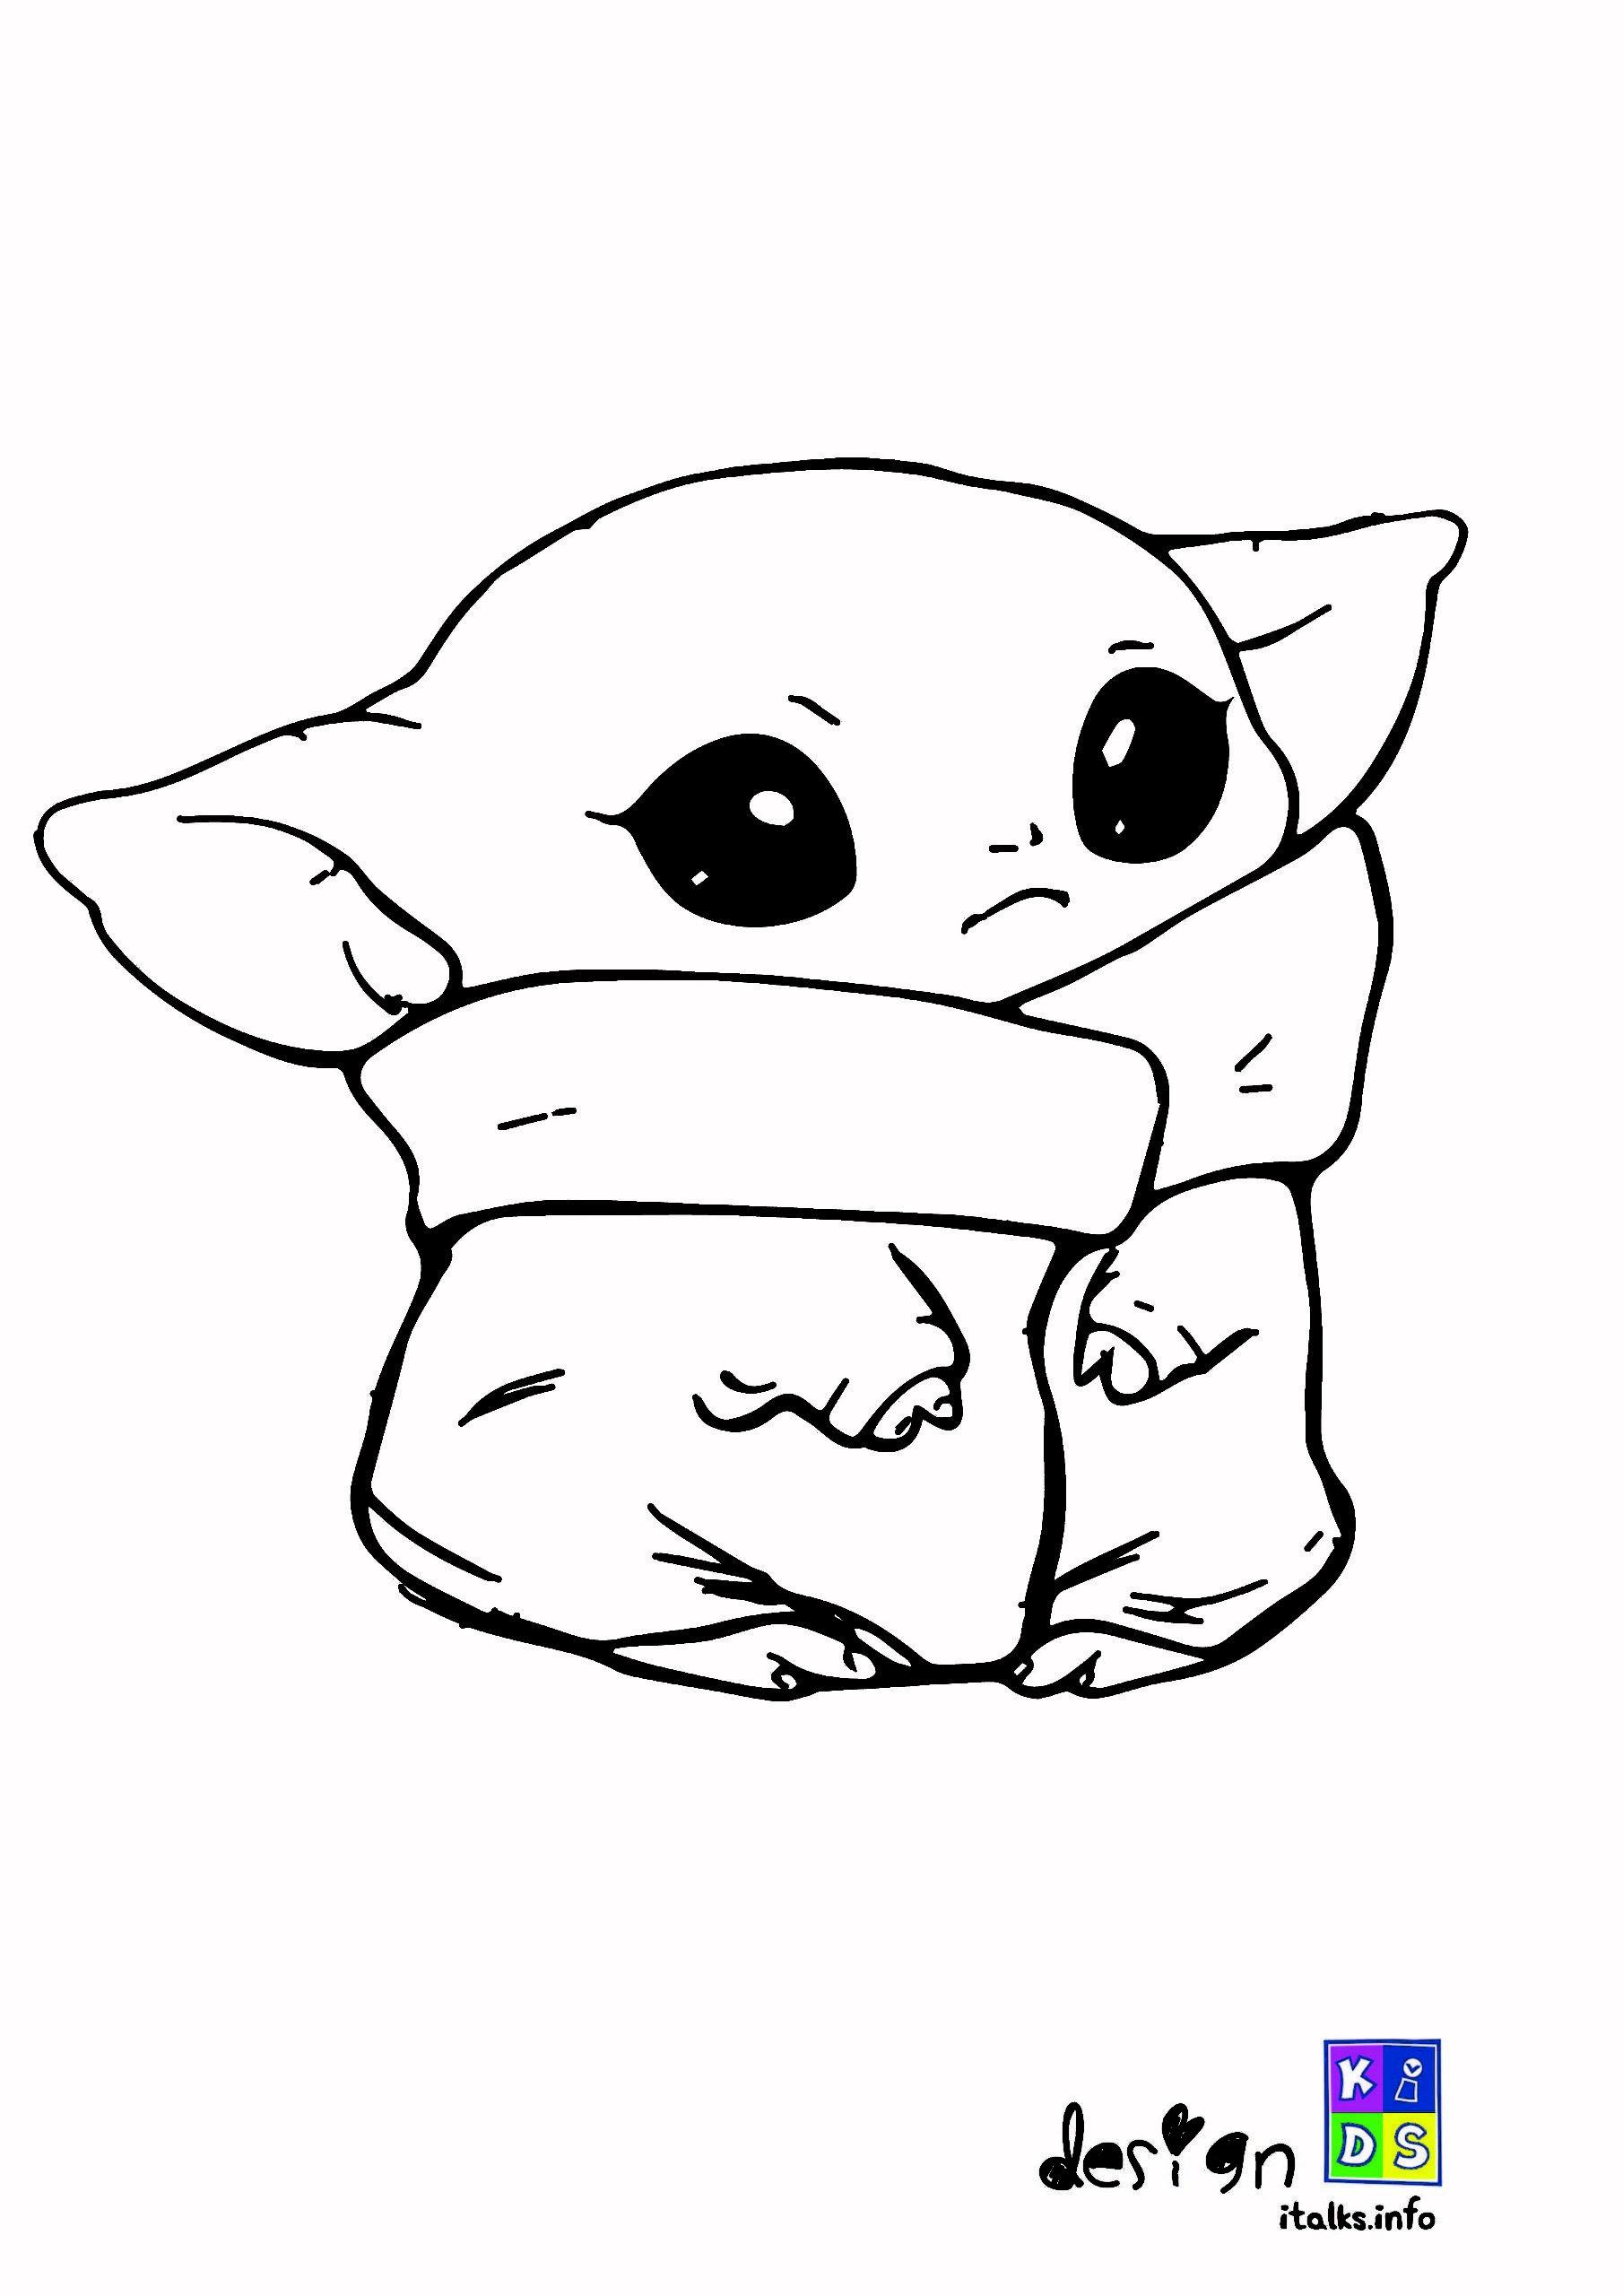 Baby Yoda Drawing In 2020 Yoda Drawing Drawing Wallpaper Coloring Books